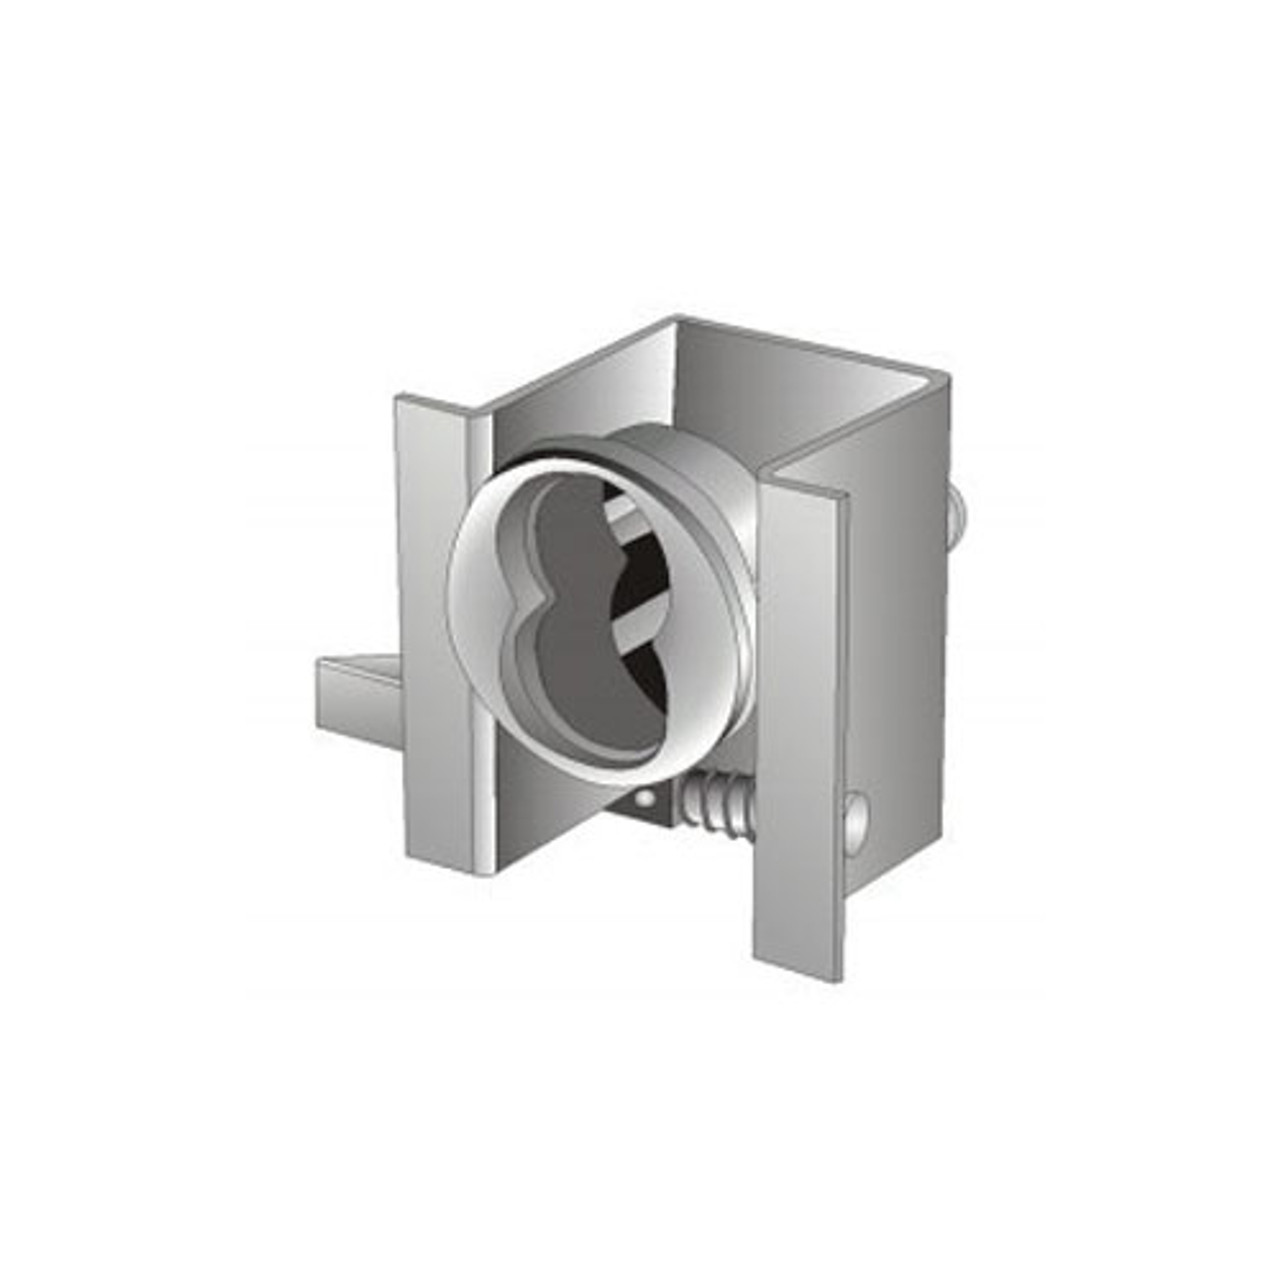 Olympus 728MBL-26D Cabinet Locks in Satin Chrome Finish